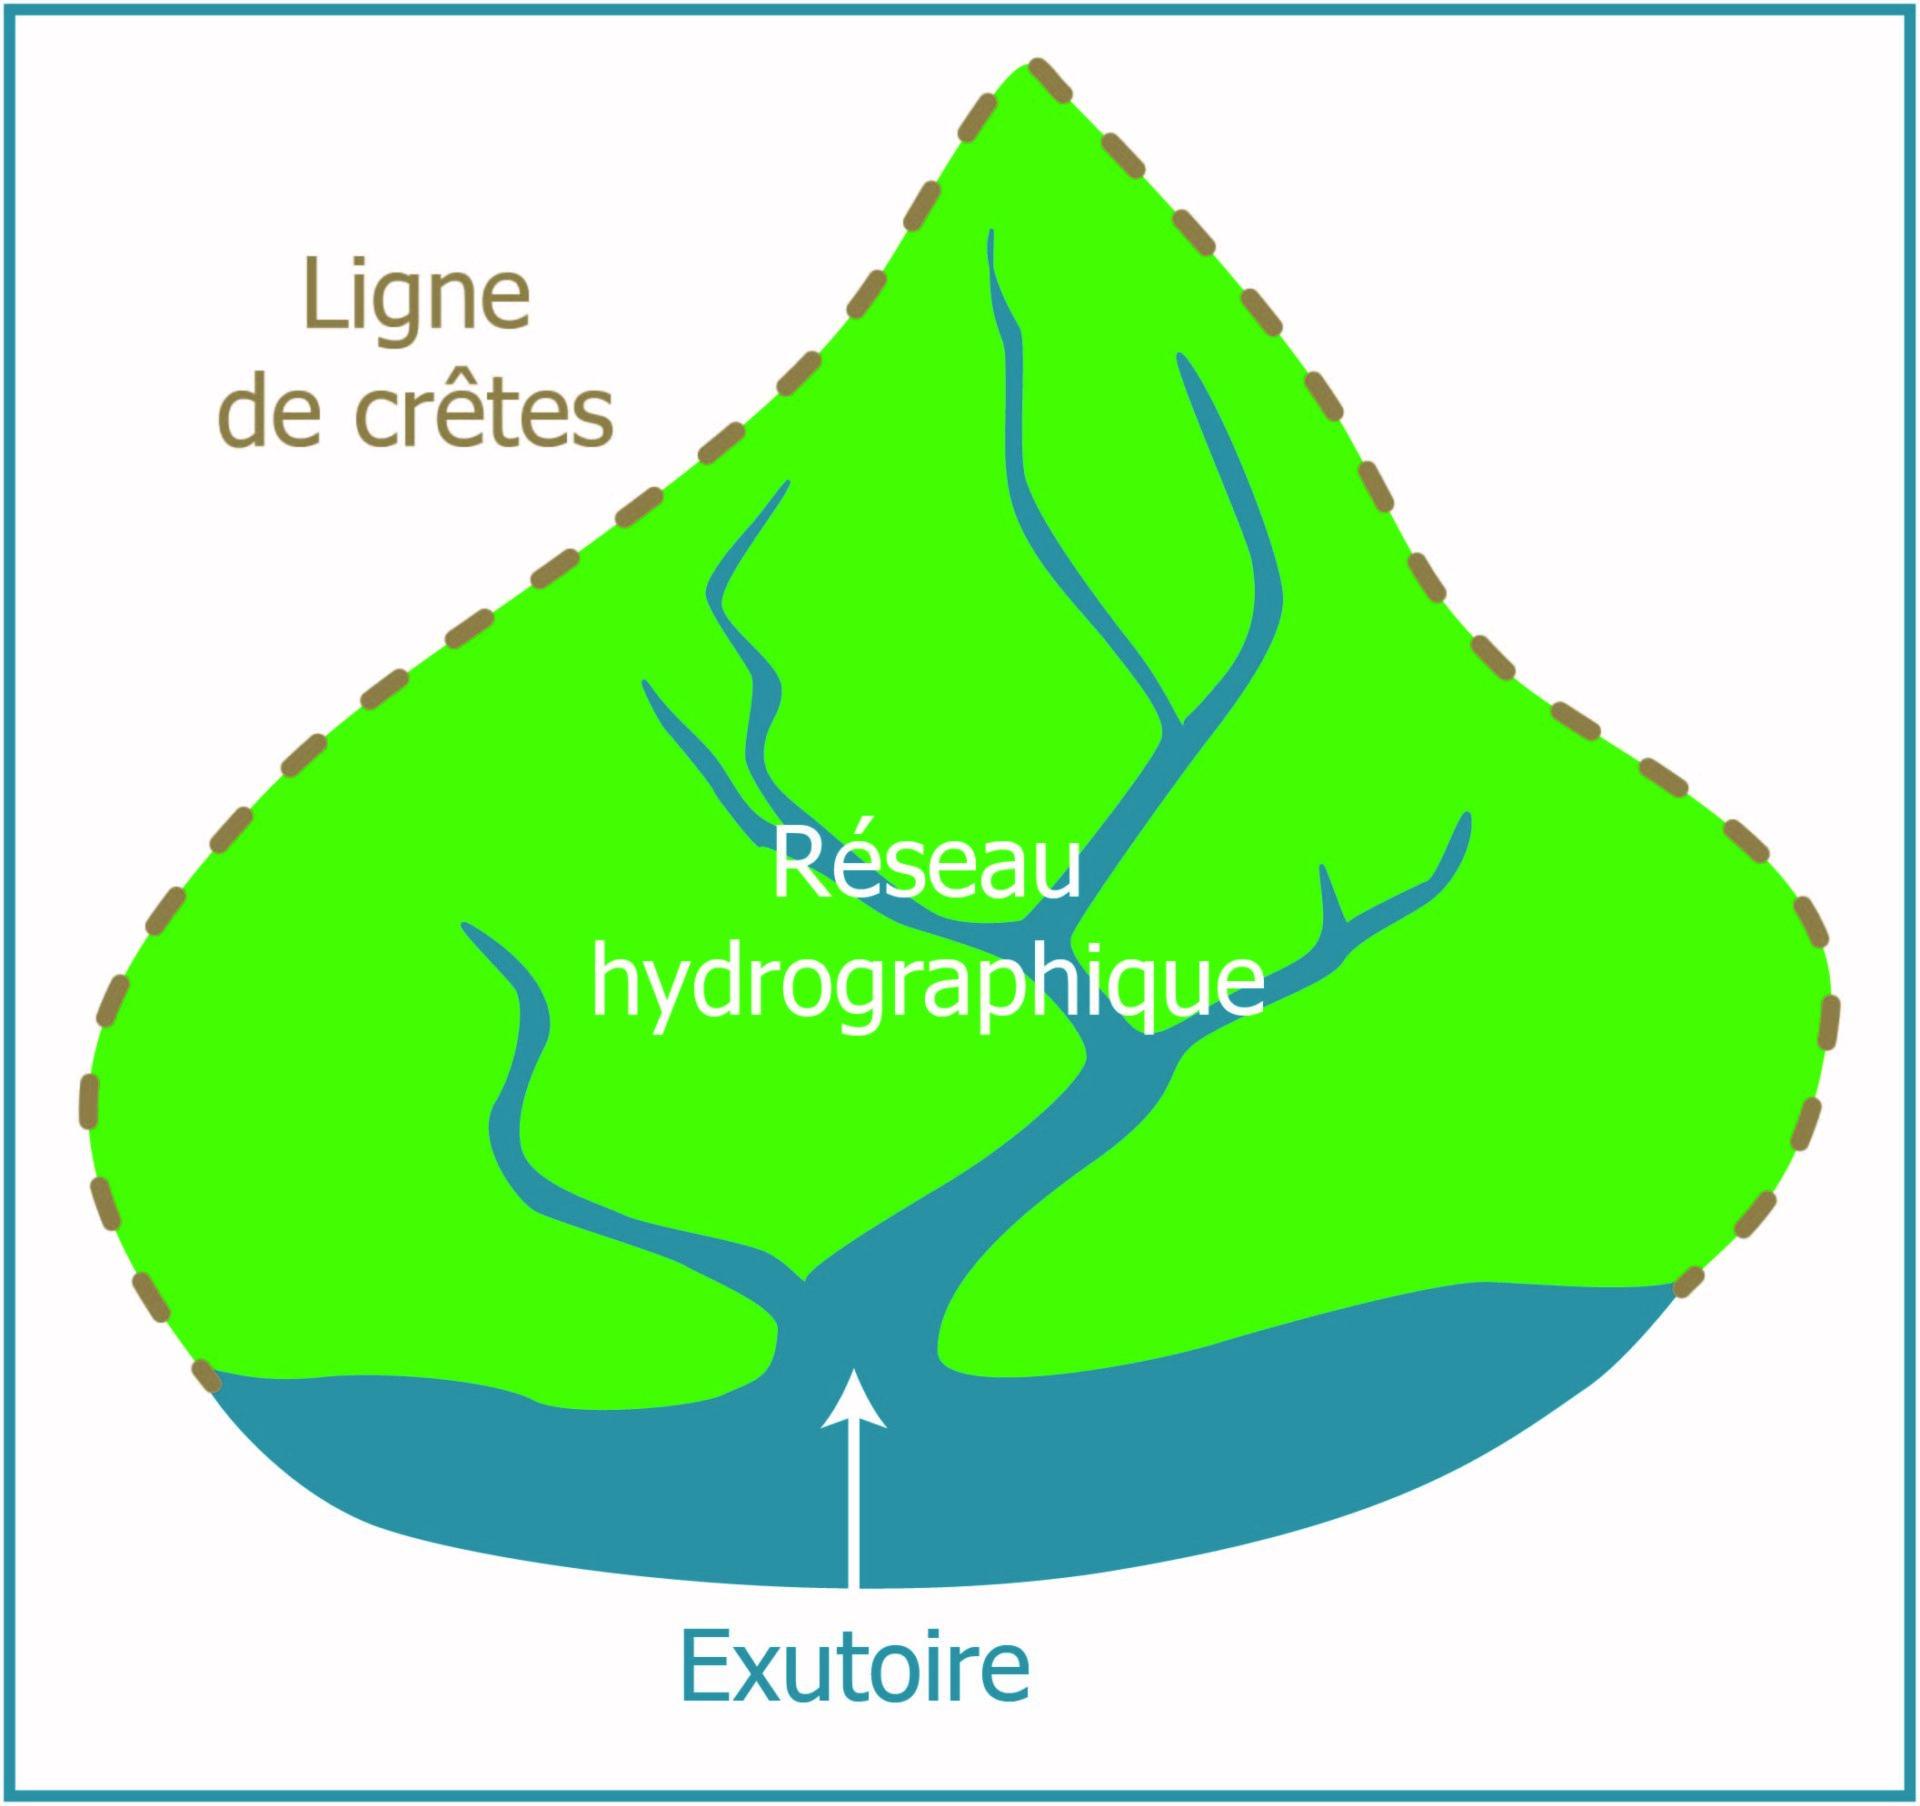 La notion de bassin versant